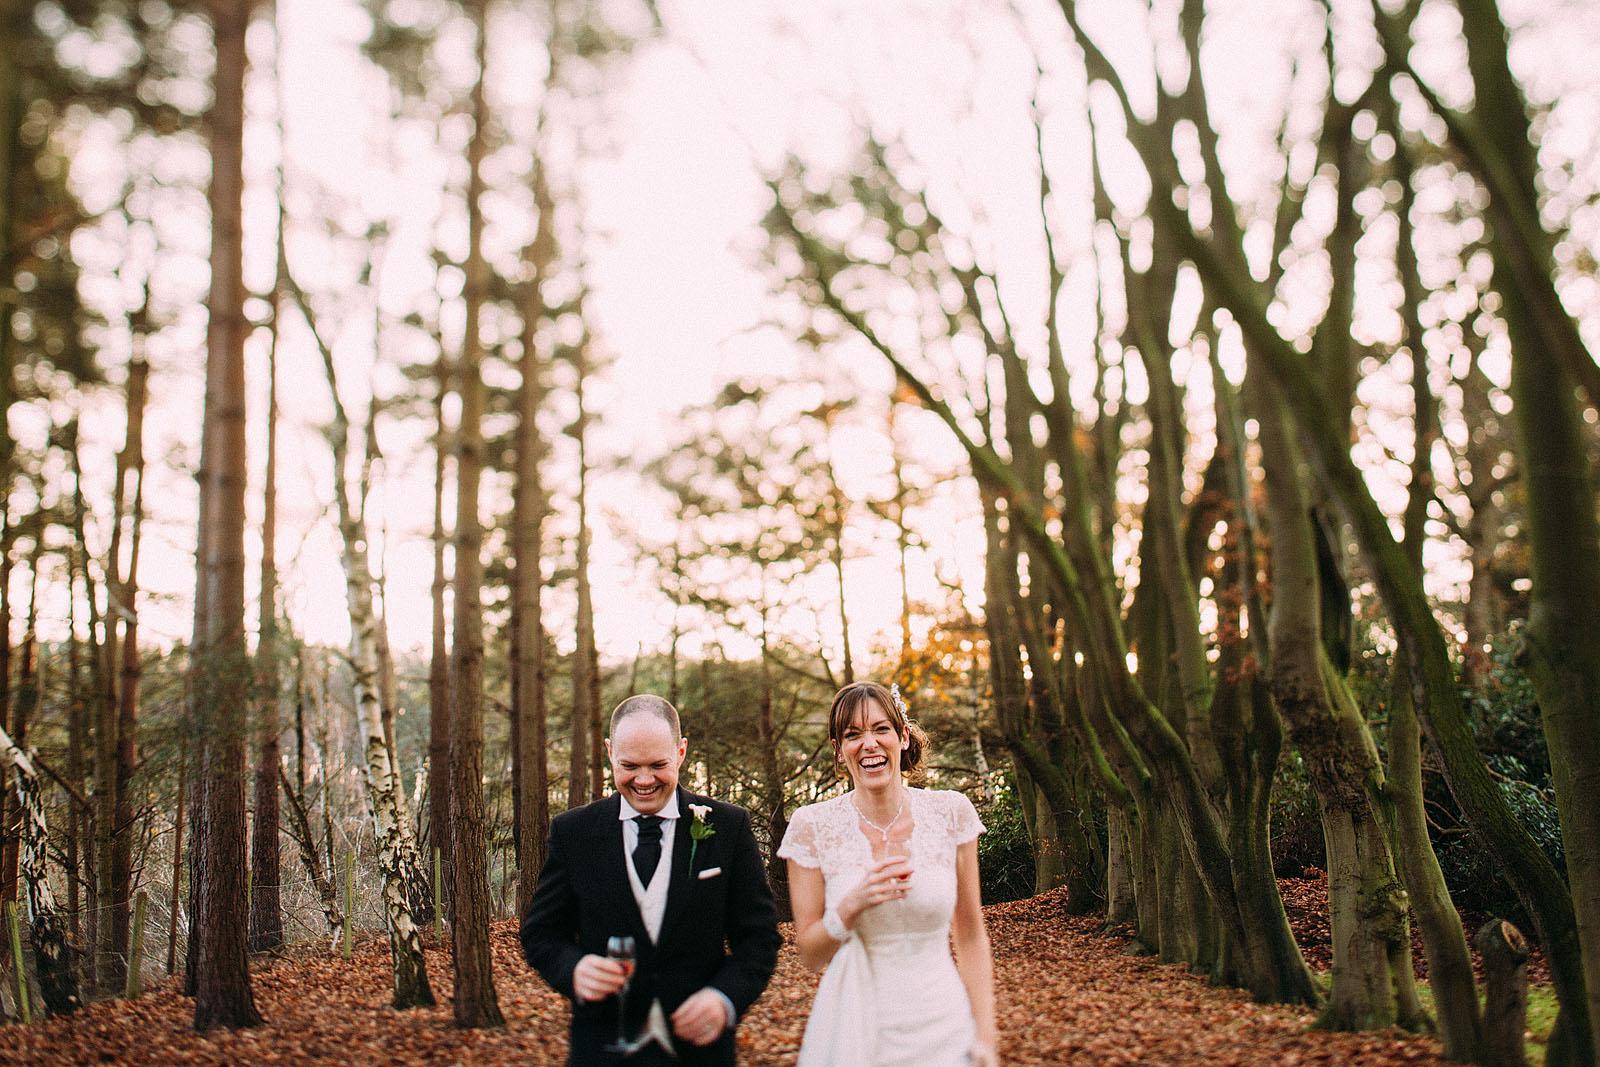 Best-2014-Lawson-Wedding-Photography0200